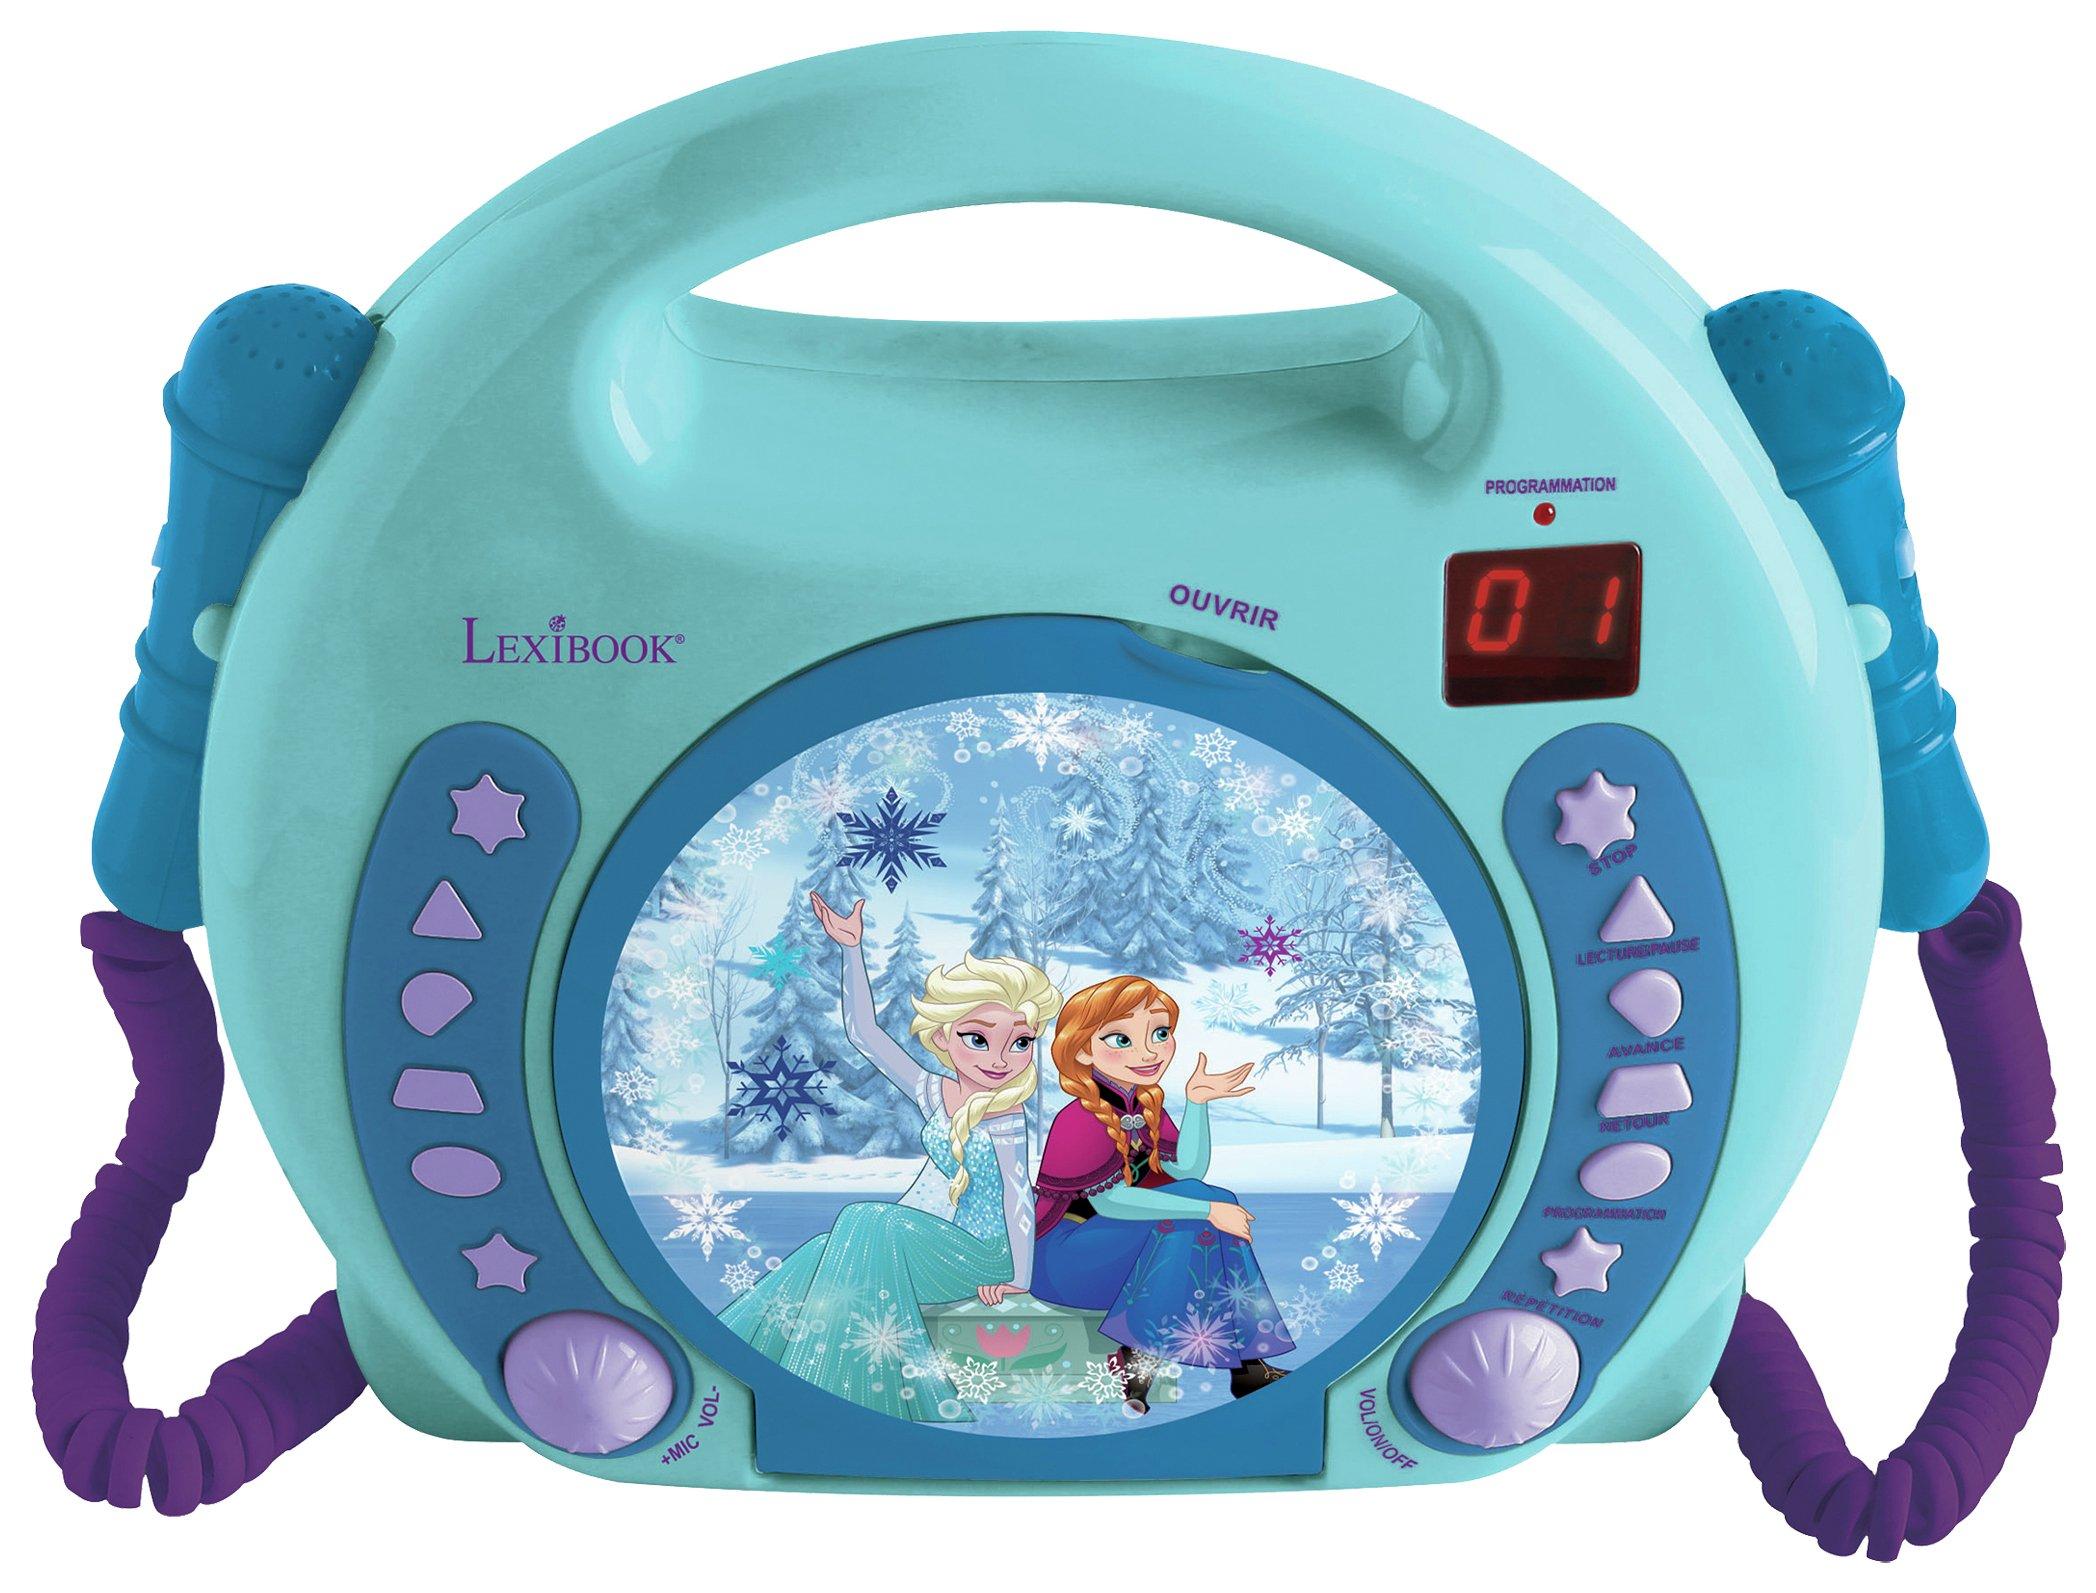 Disney Frozen CD Player with 2 Microphones.